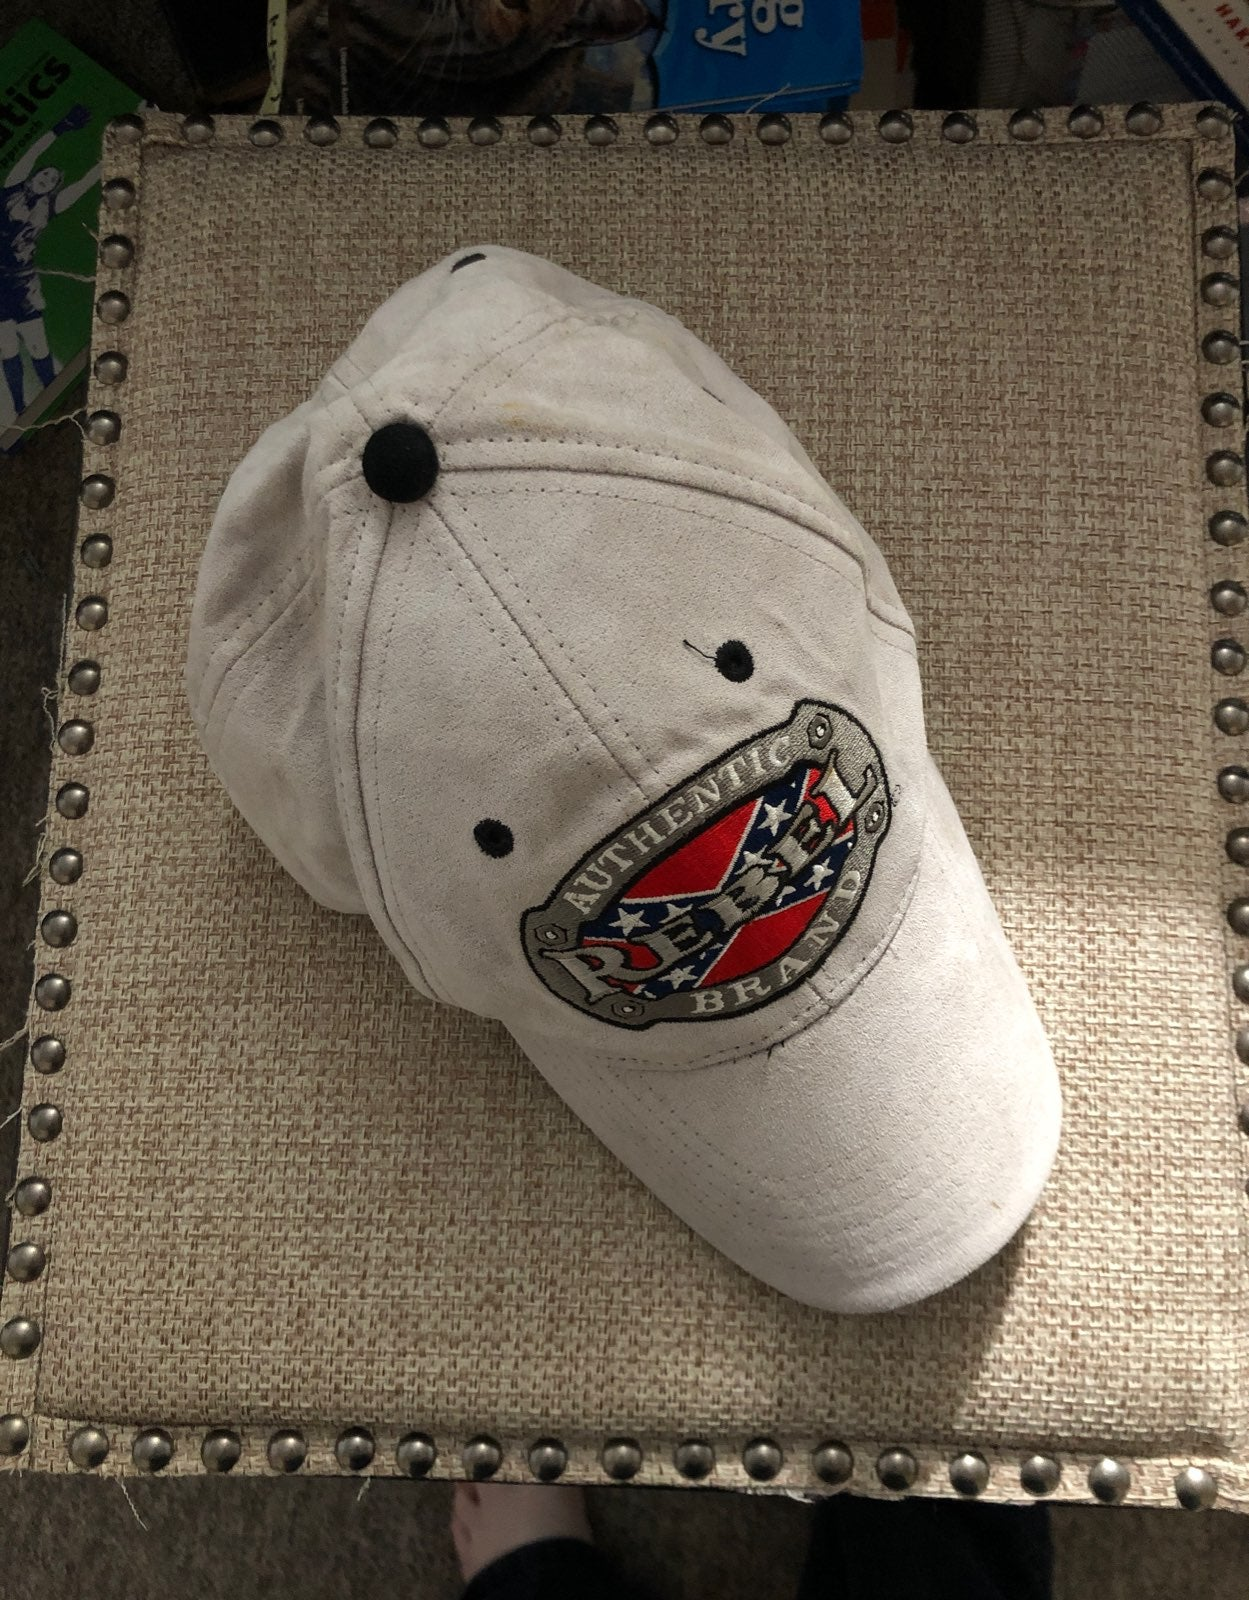 Authentic Rebel brand ball cap